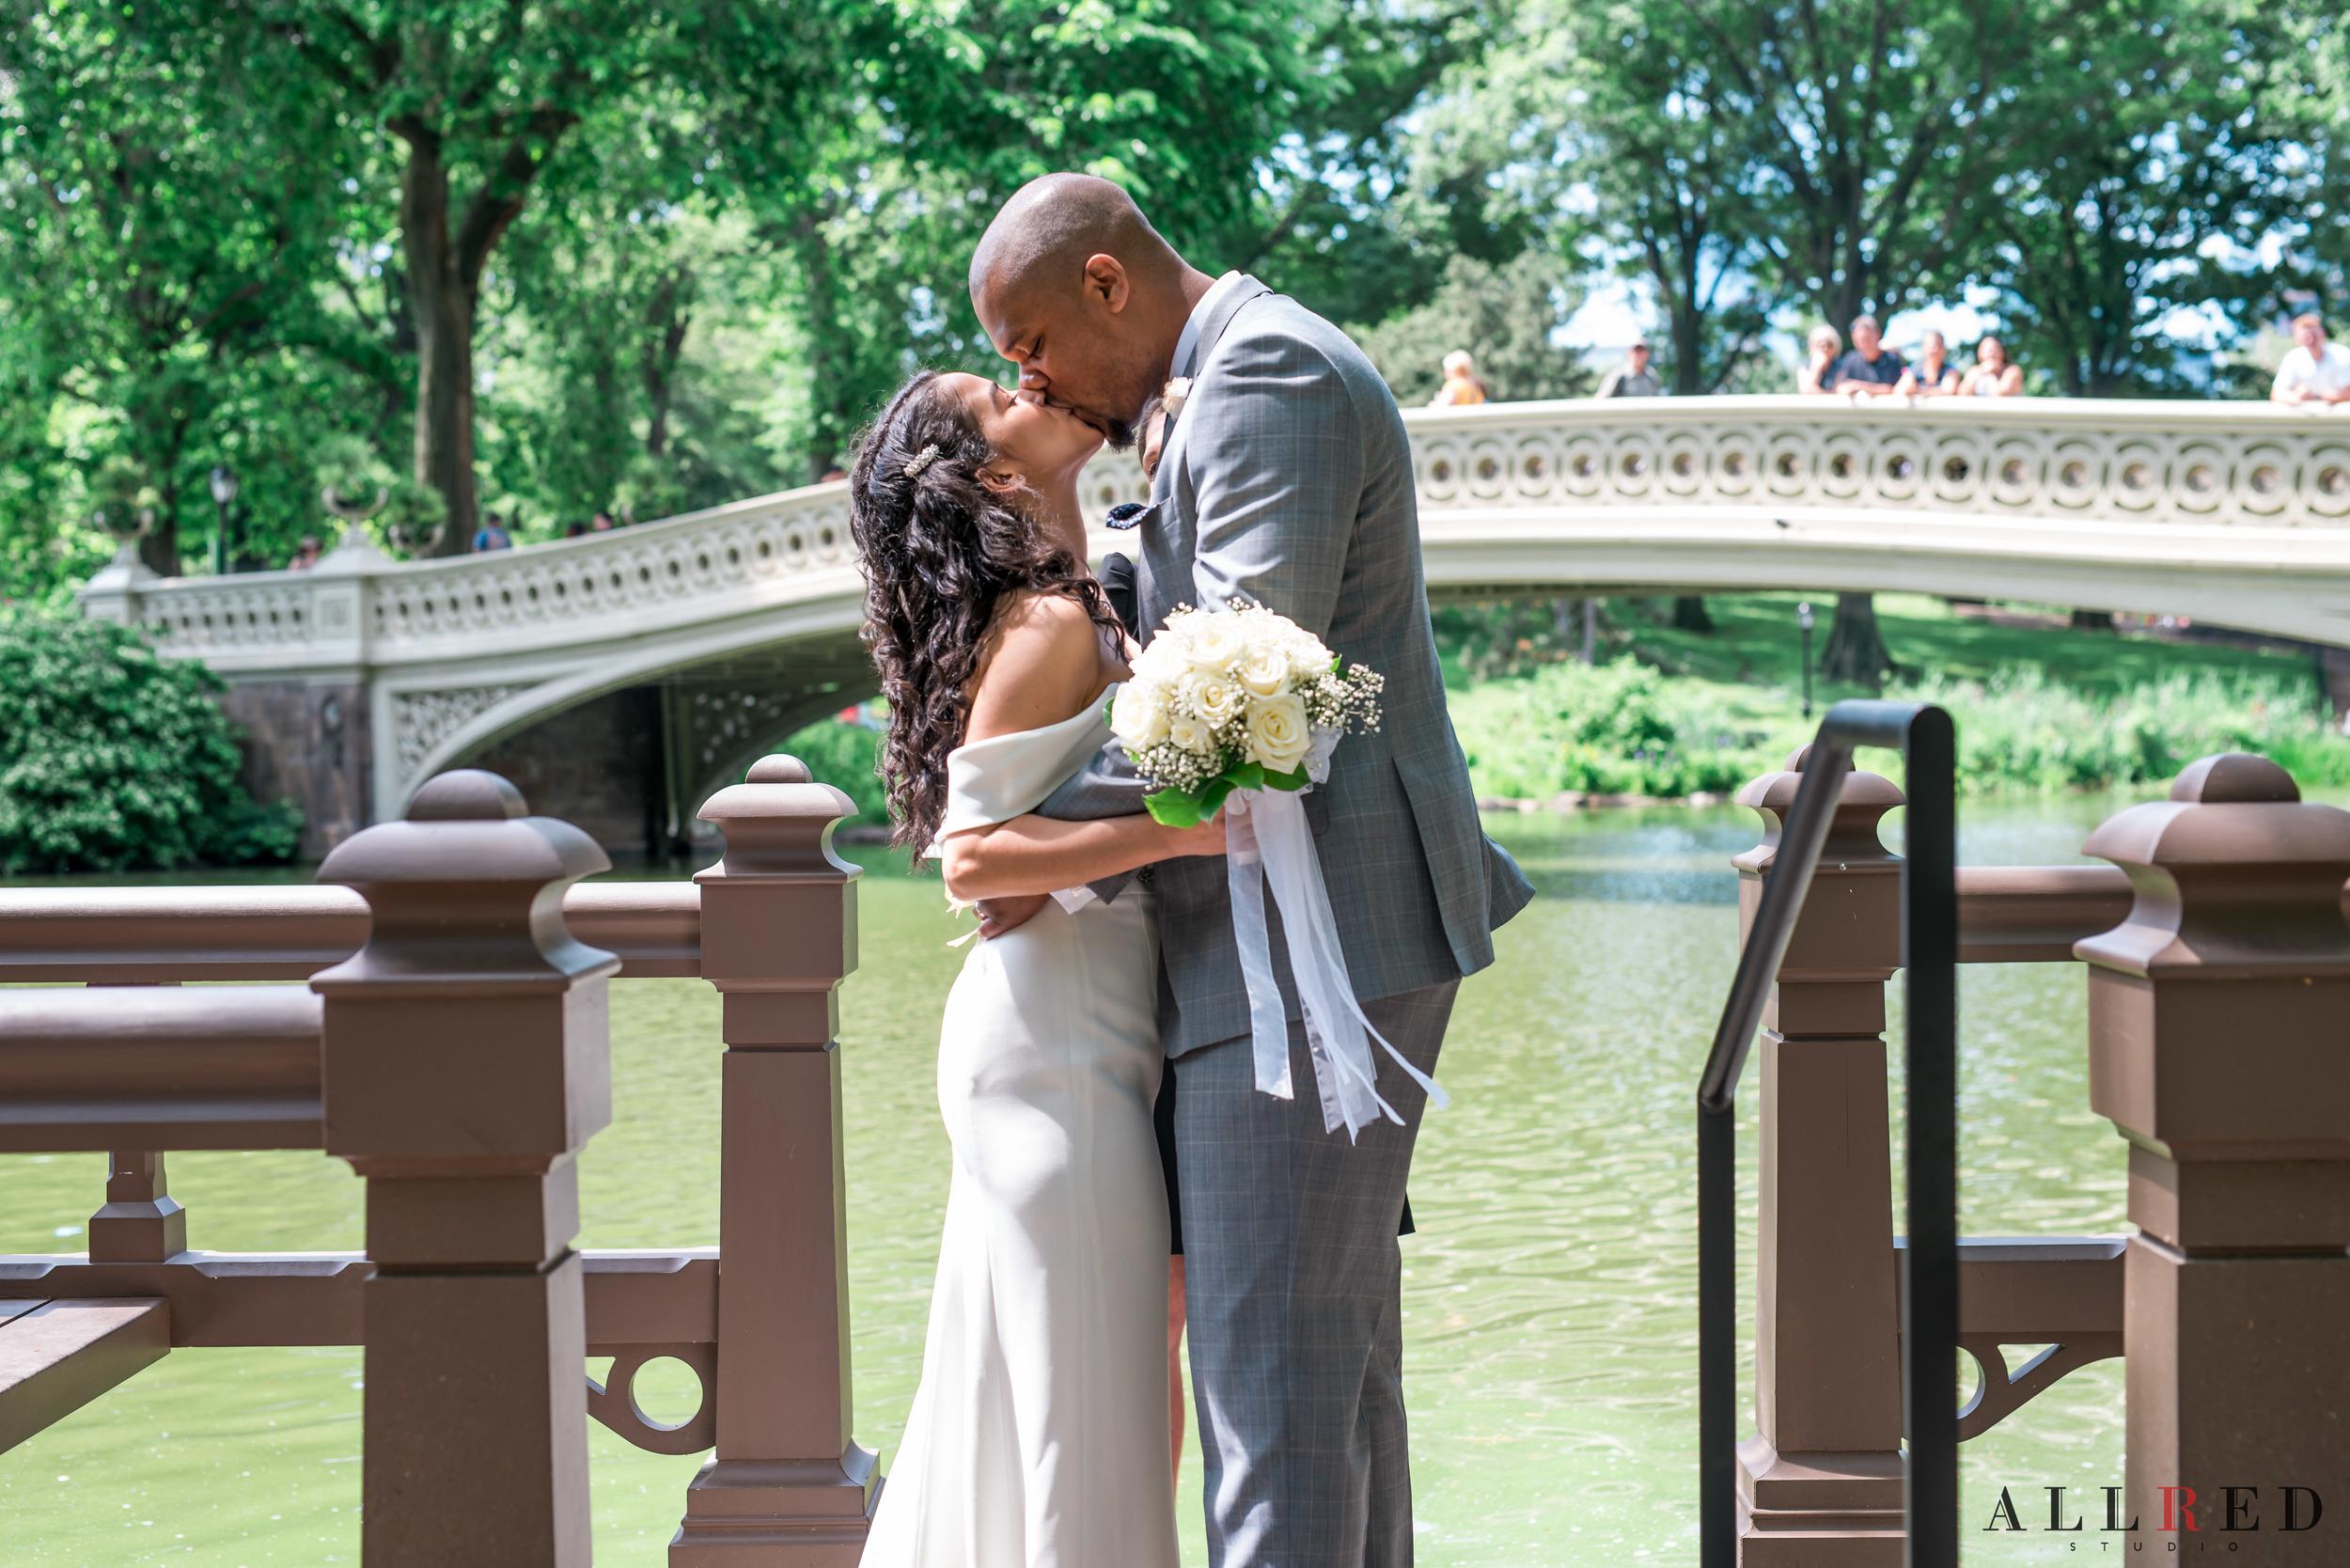 Wedding-central-park-allred-studio-new-york-photographer-new-jersey-hudson-valley-2149.jpg